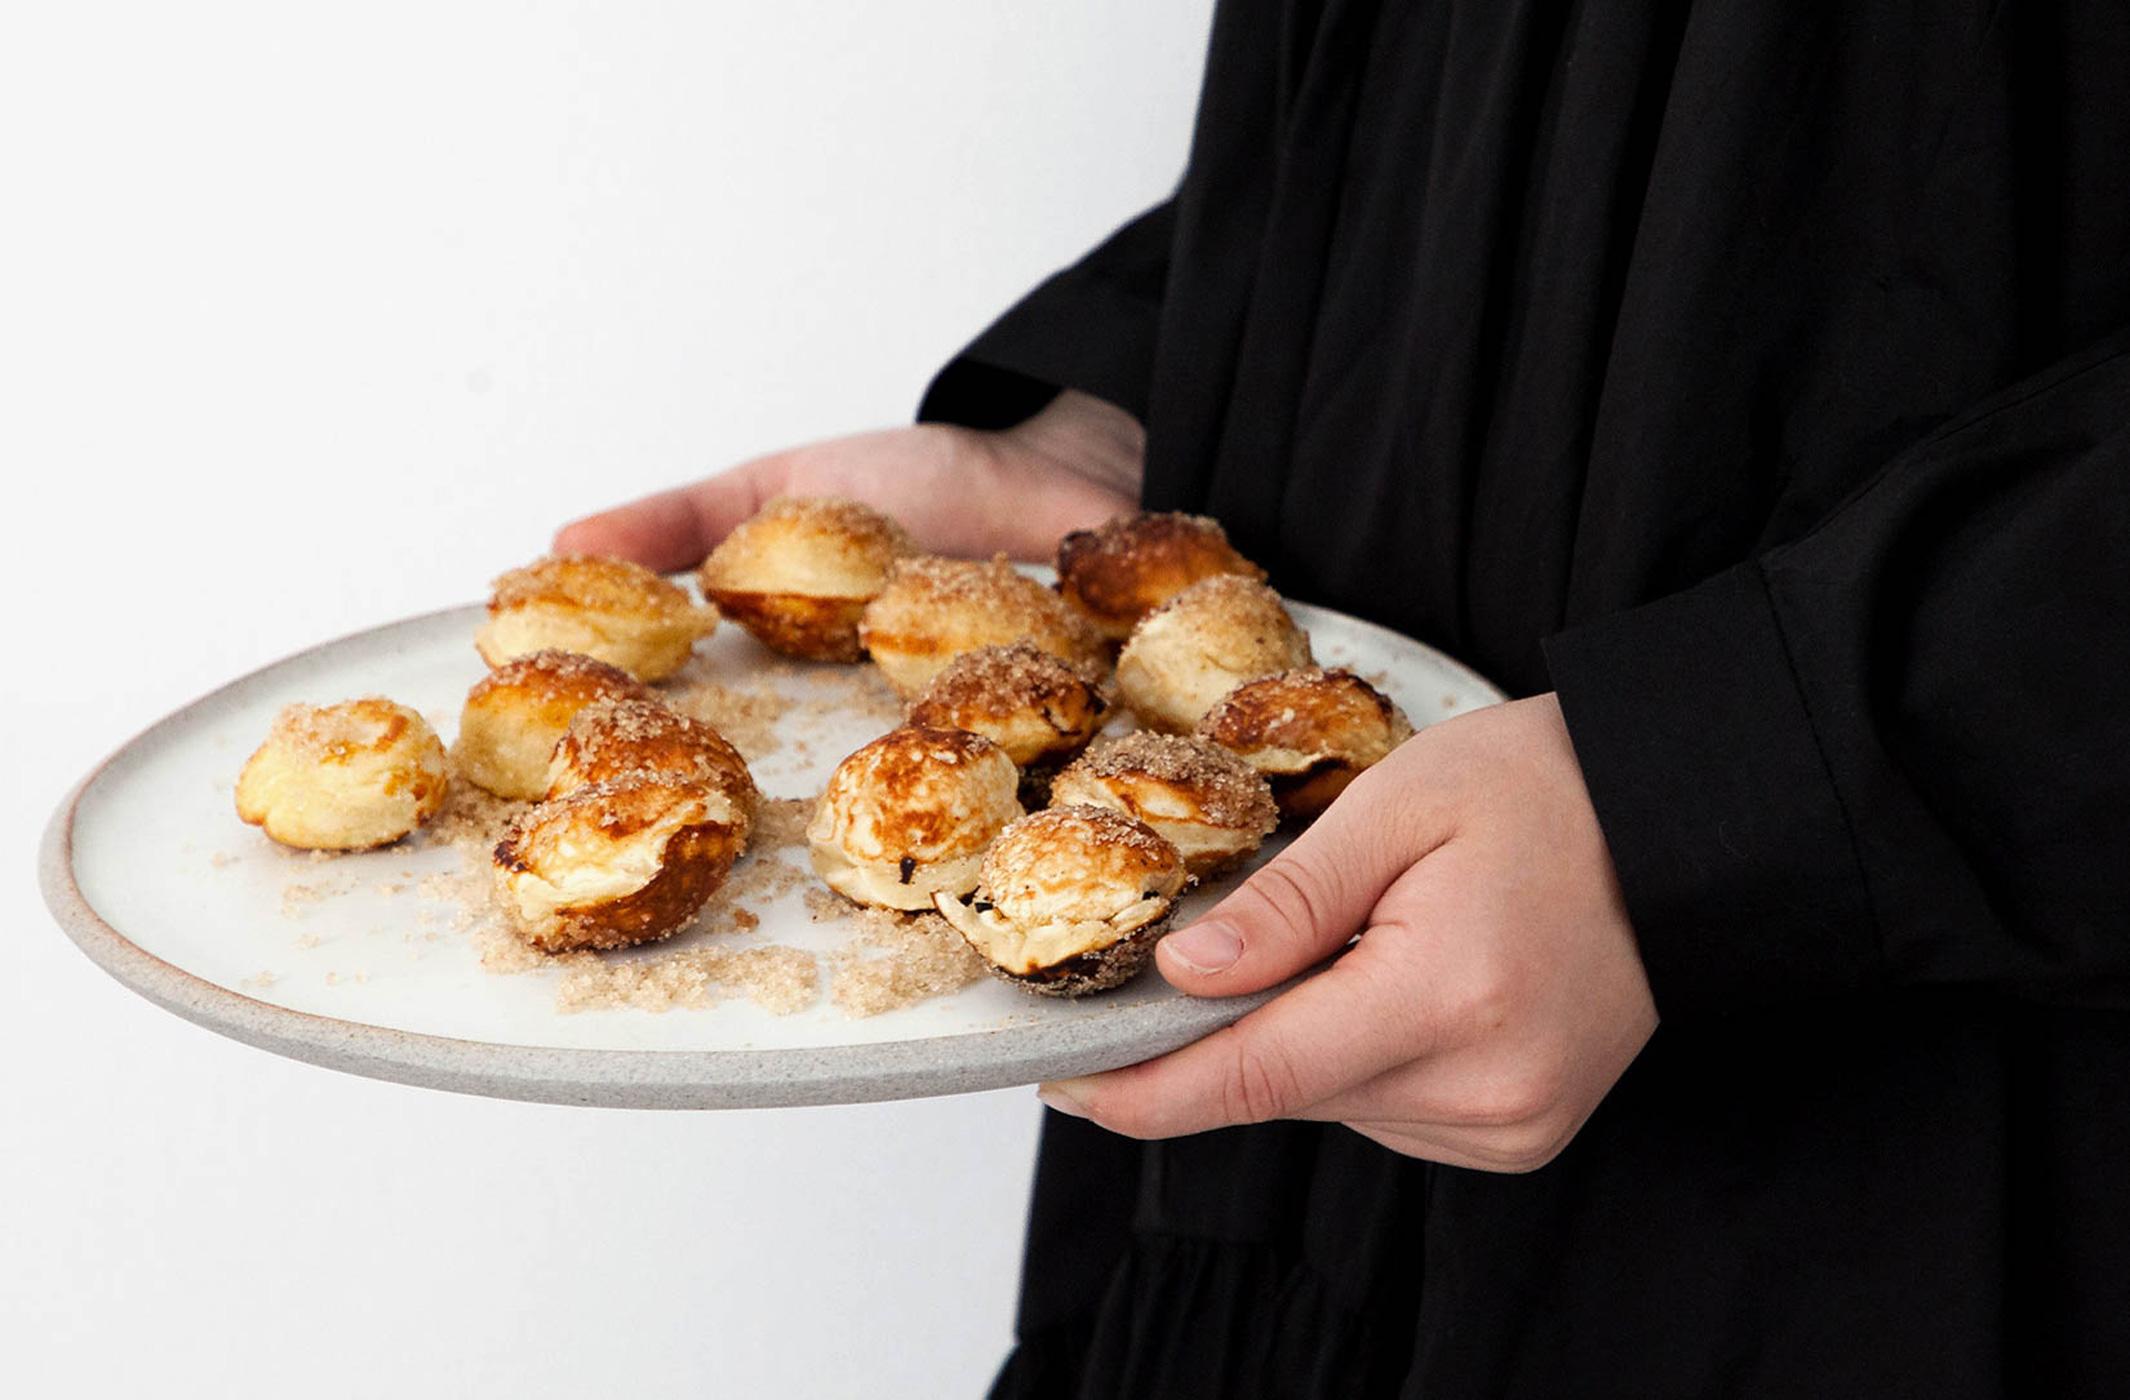 Quarkbällchen ohne Friteuse backen